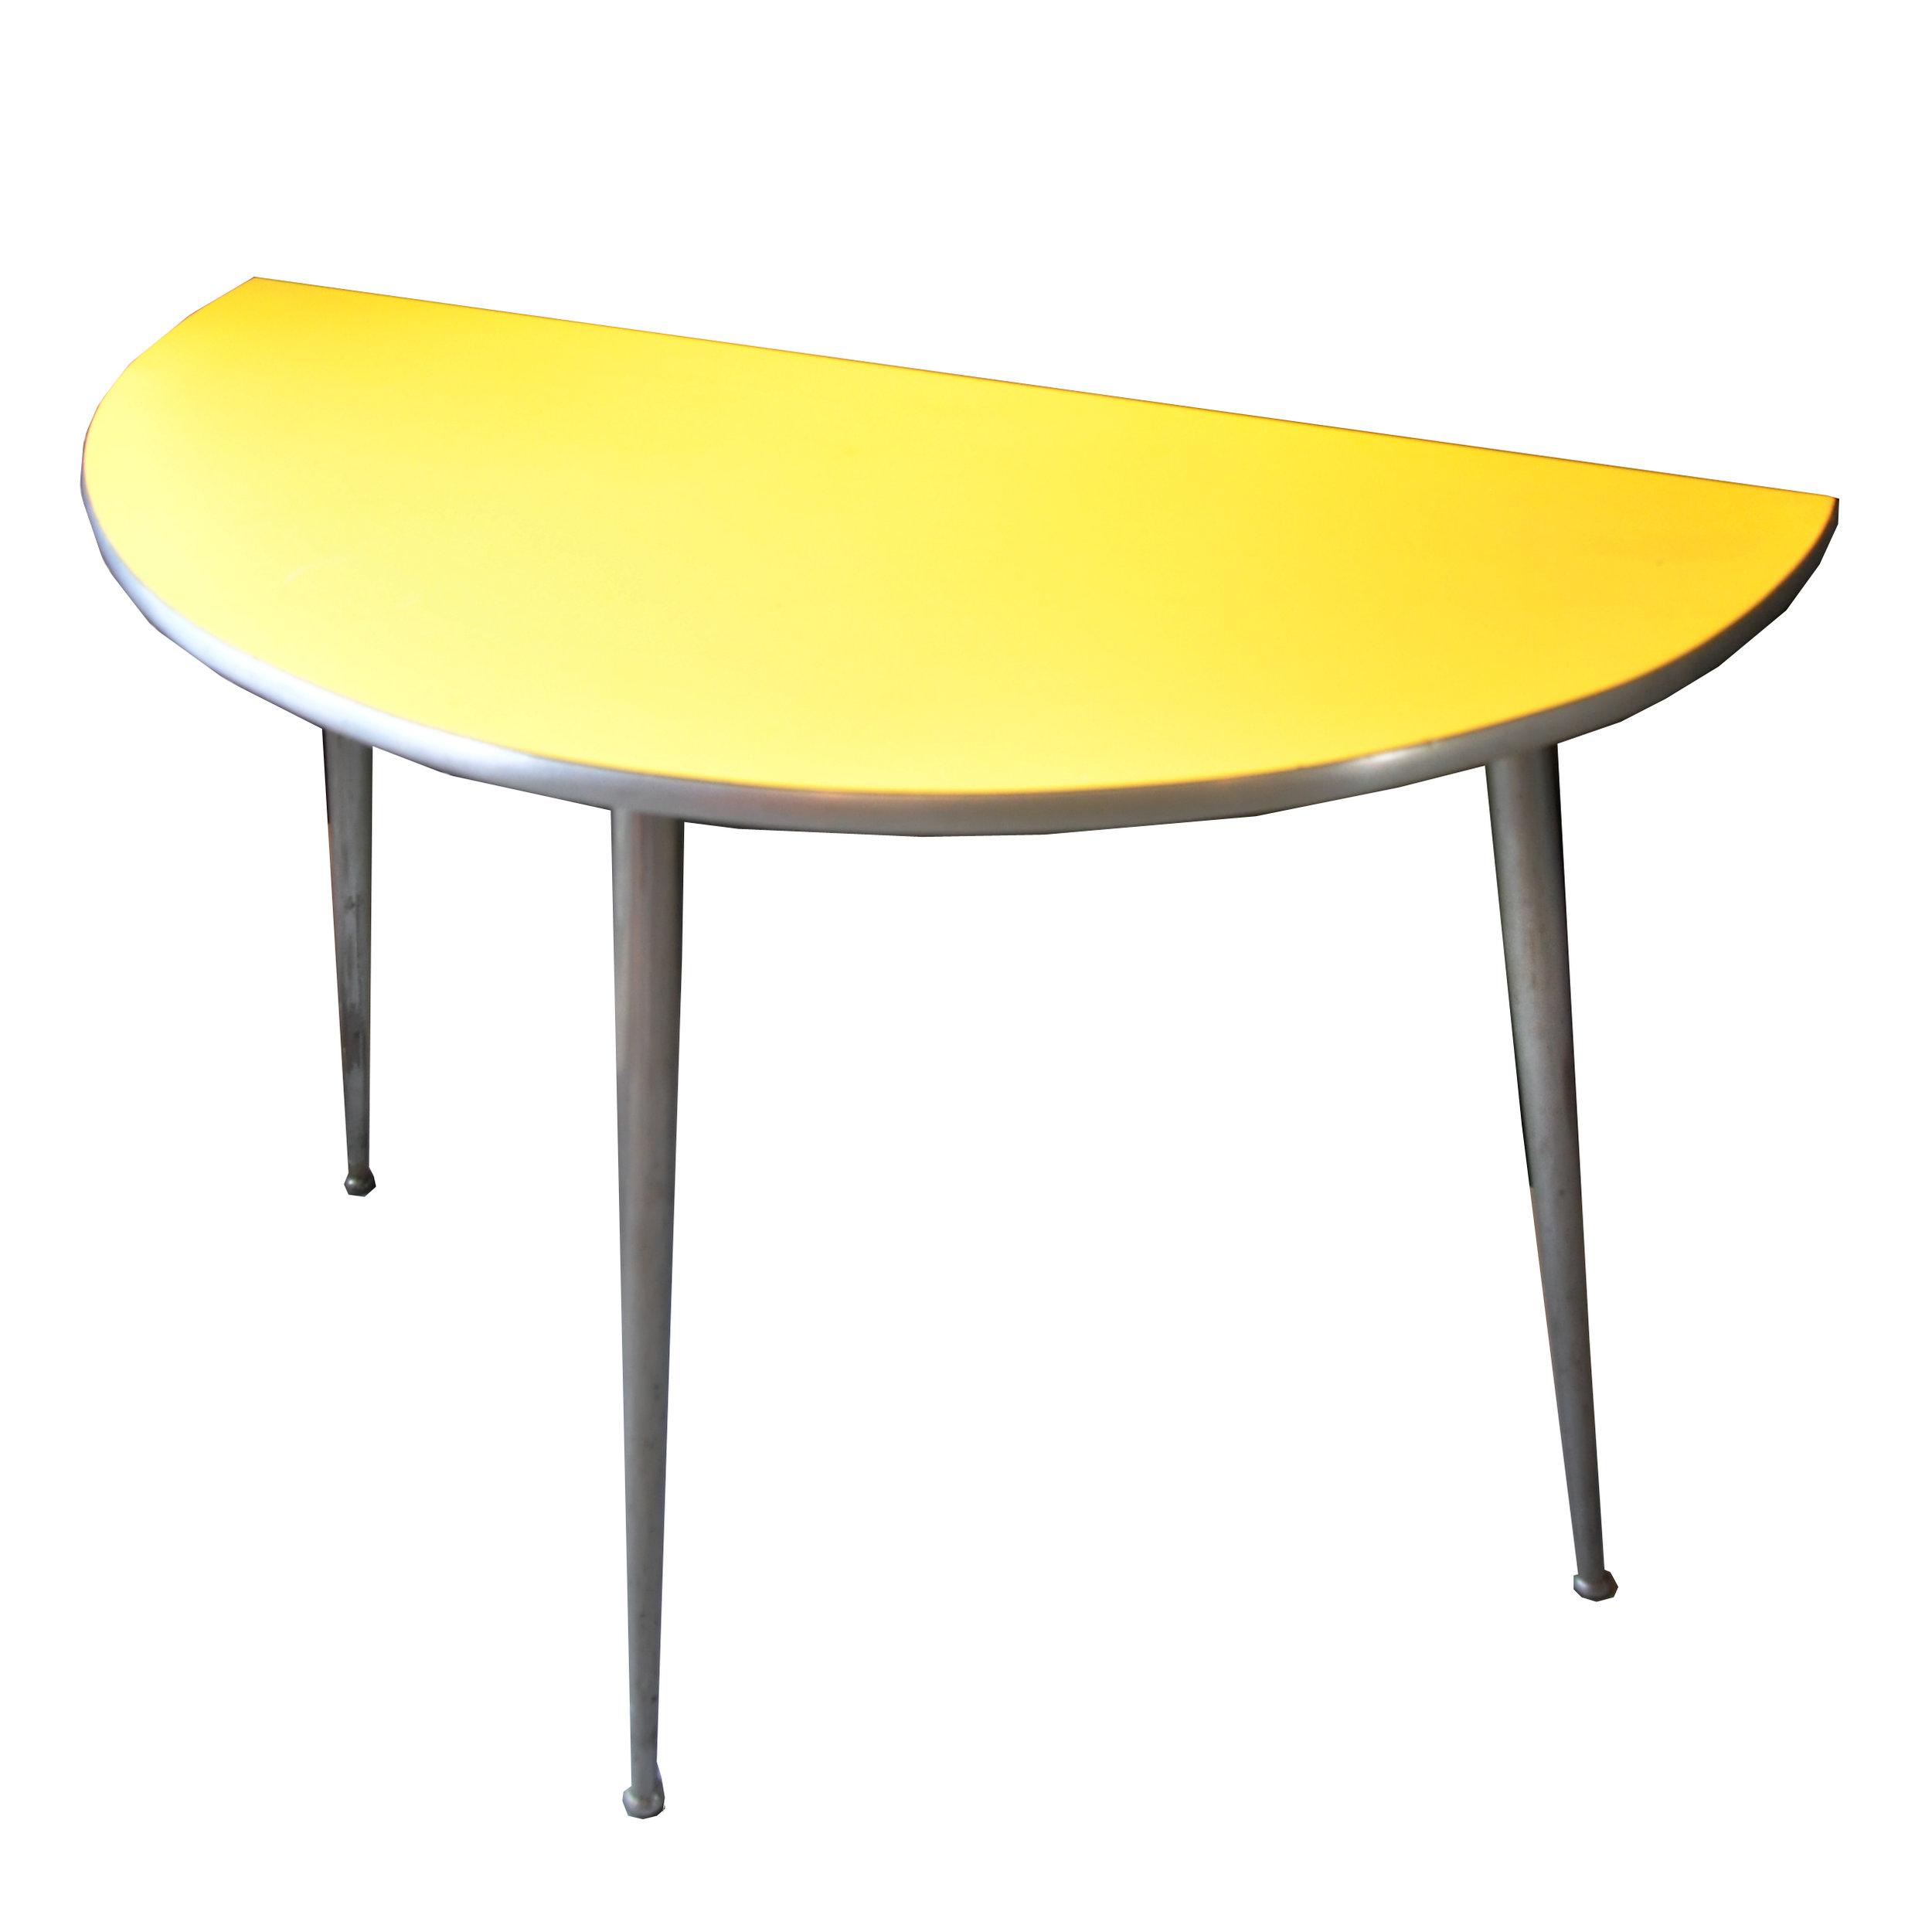 Gelbe Konsole -